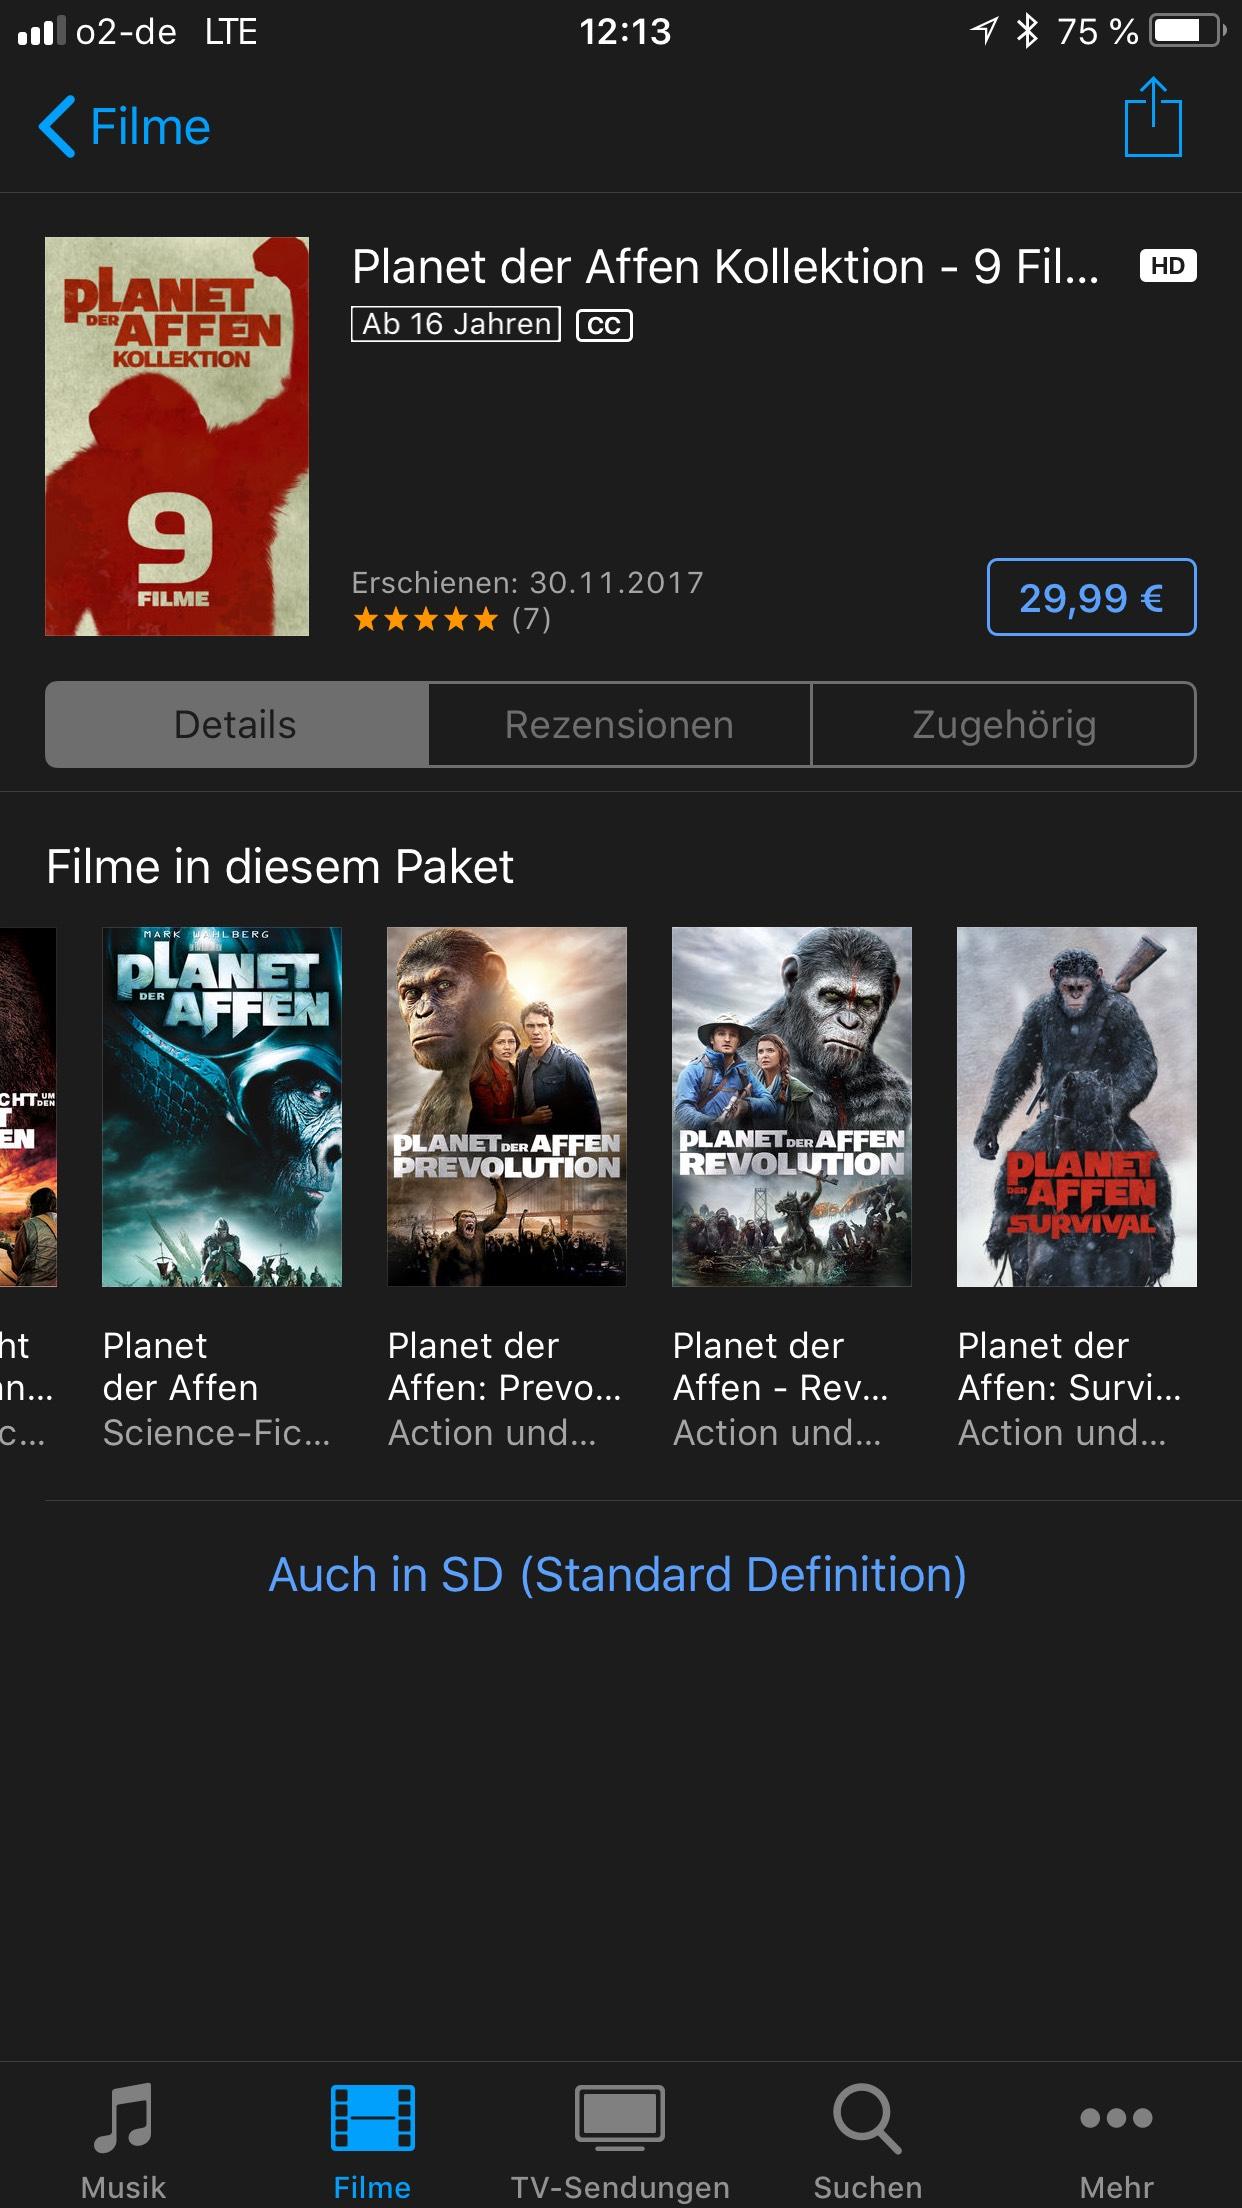 iTunes - Planet der Affen 9 Filme